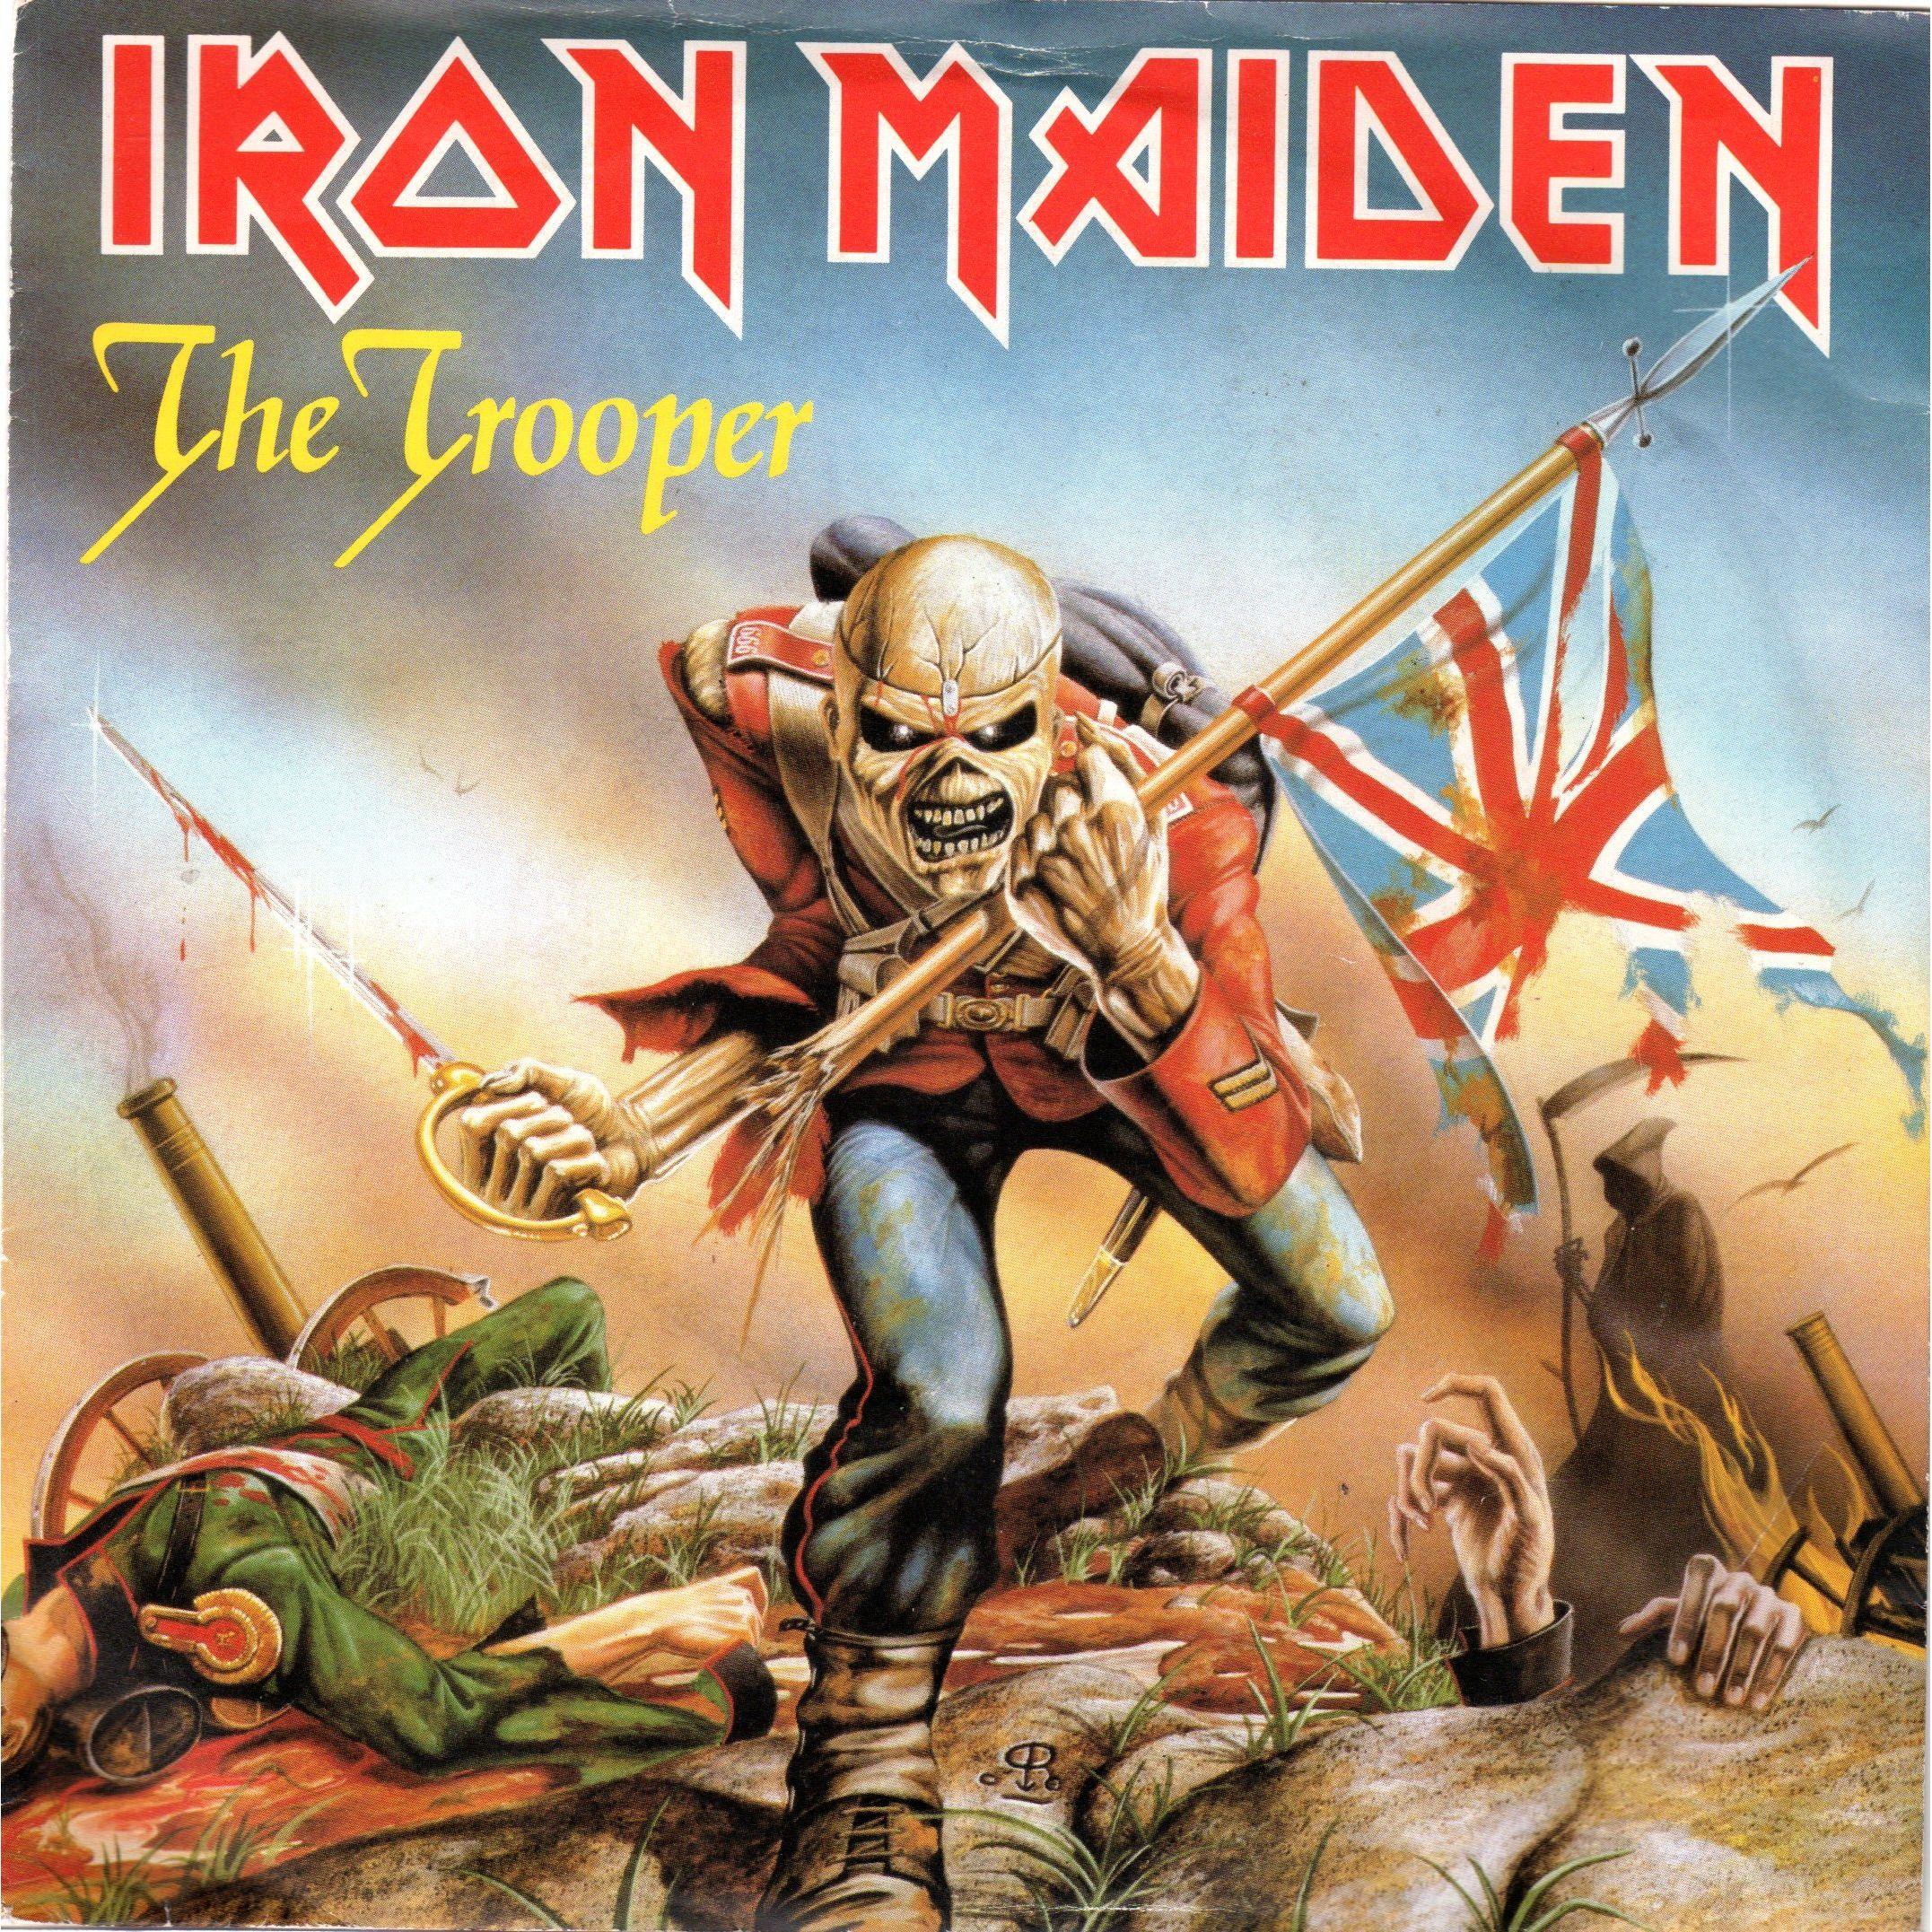 The Trooper 12 Album Cover Iron Maiden Iron Maiden Albums Iron Maiden Posters Iron Maiden The Trooper